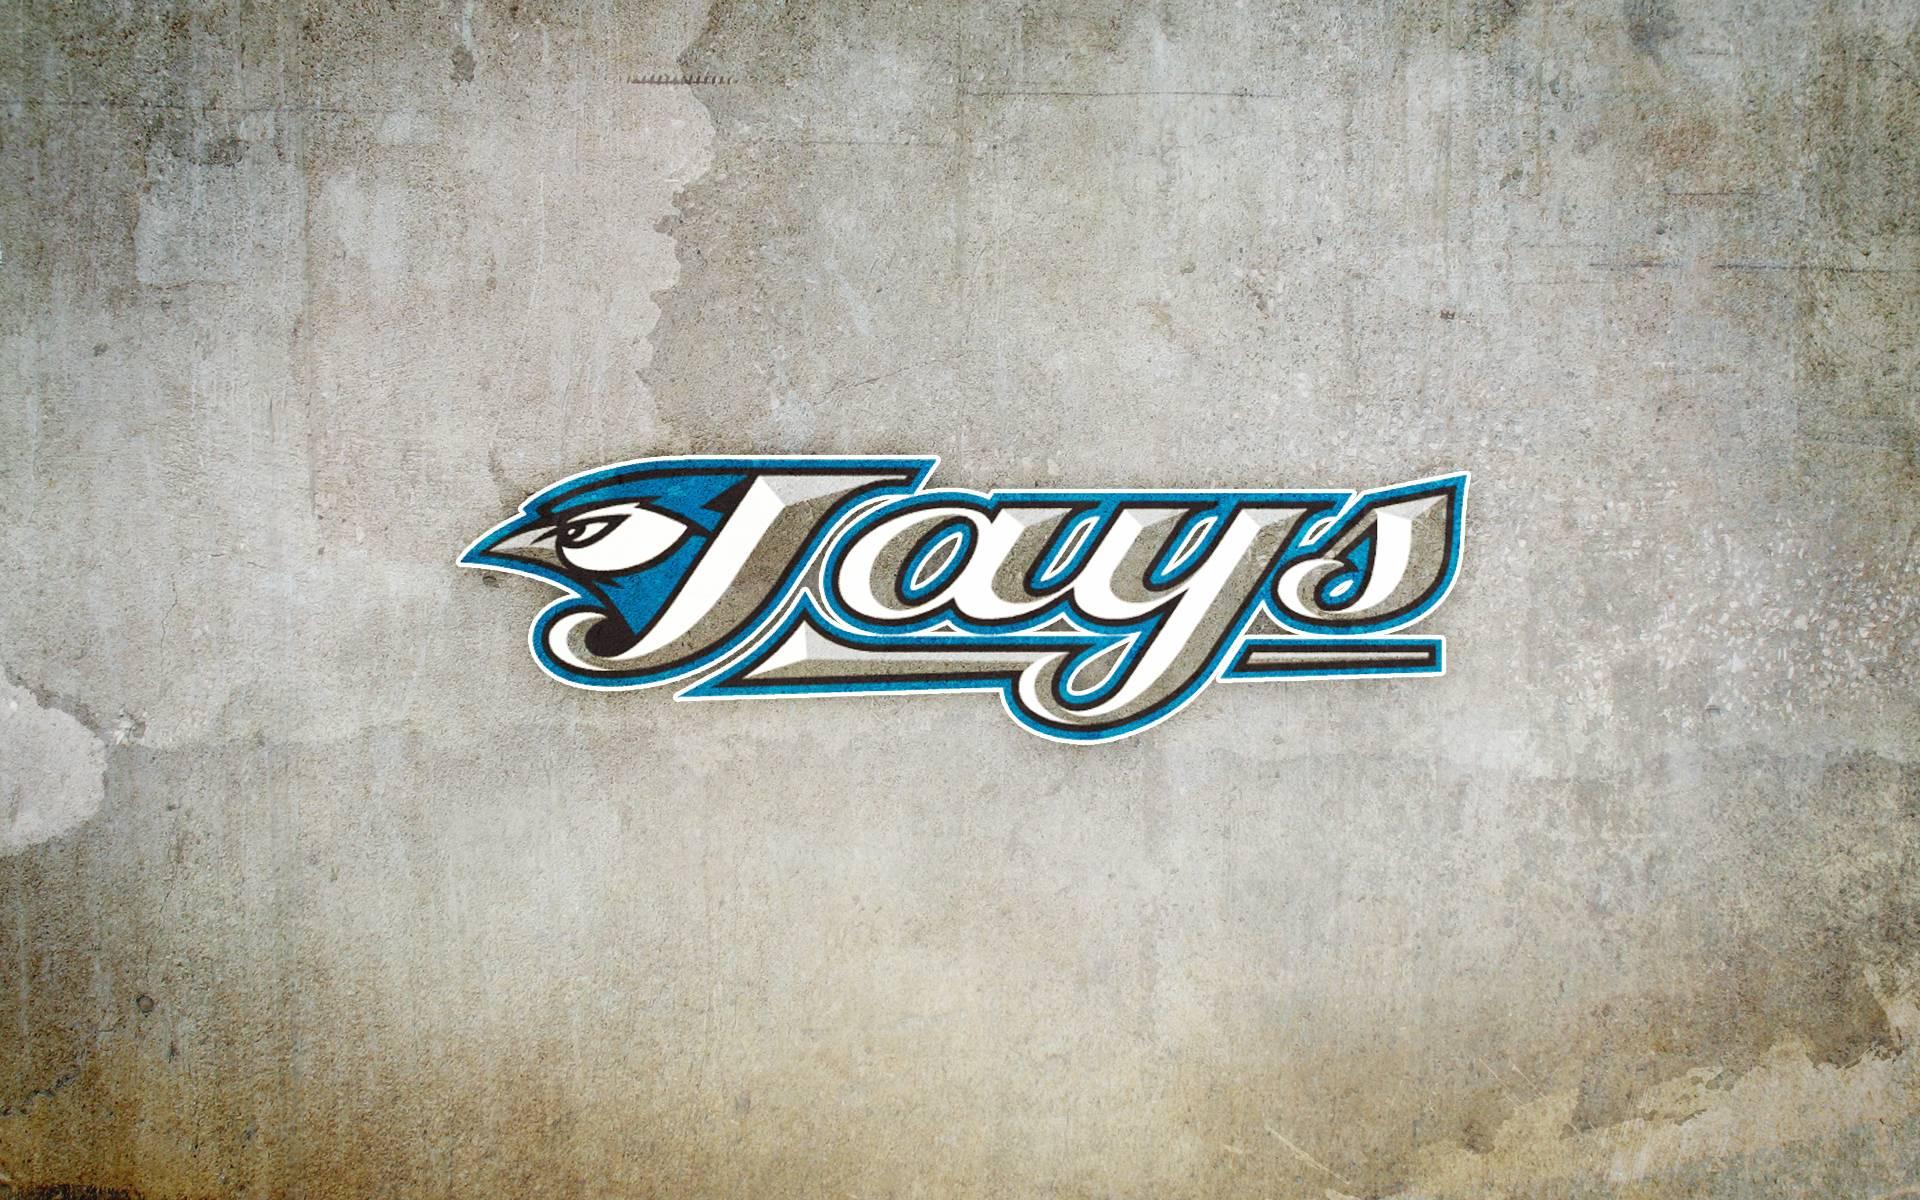 Toronto Blue Jays Wallpapers Wallpaper Cave